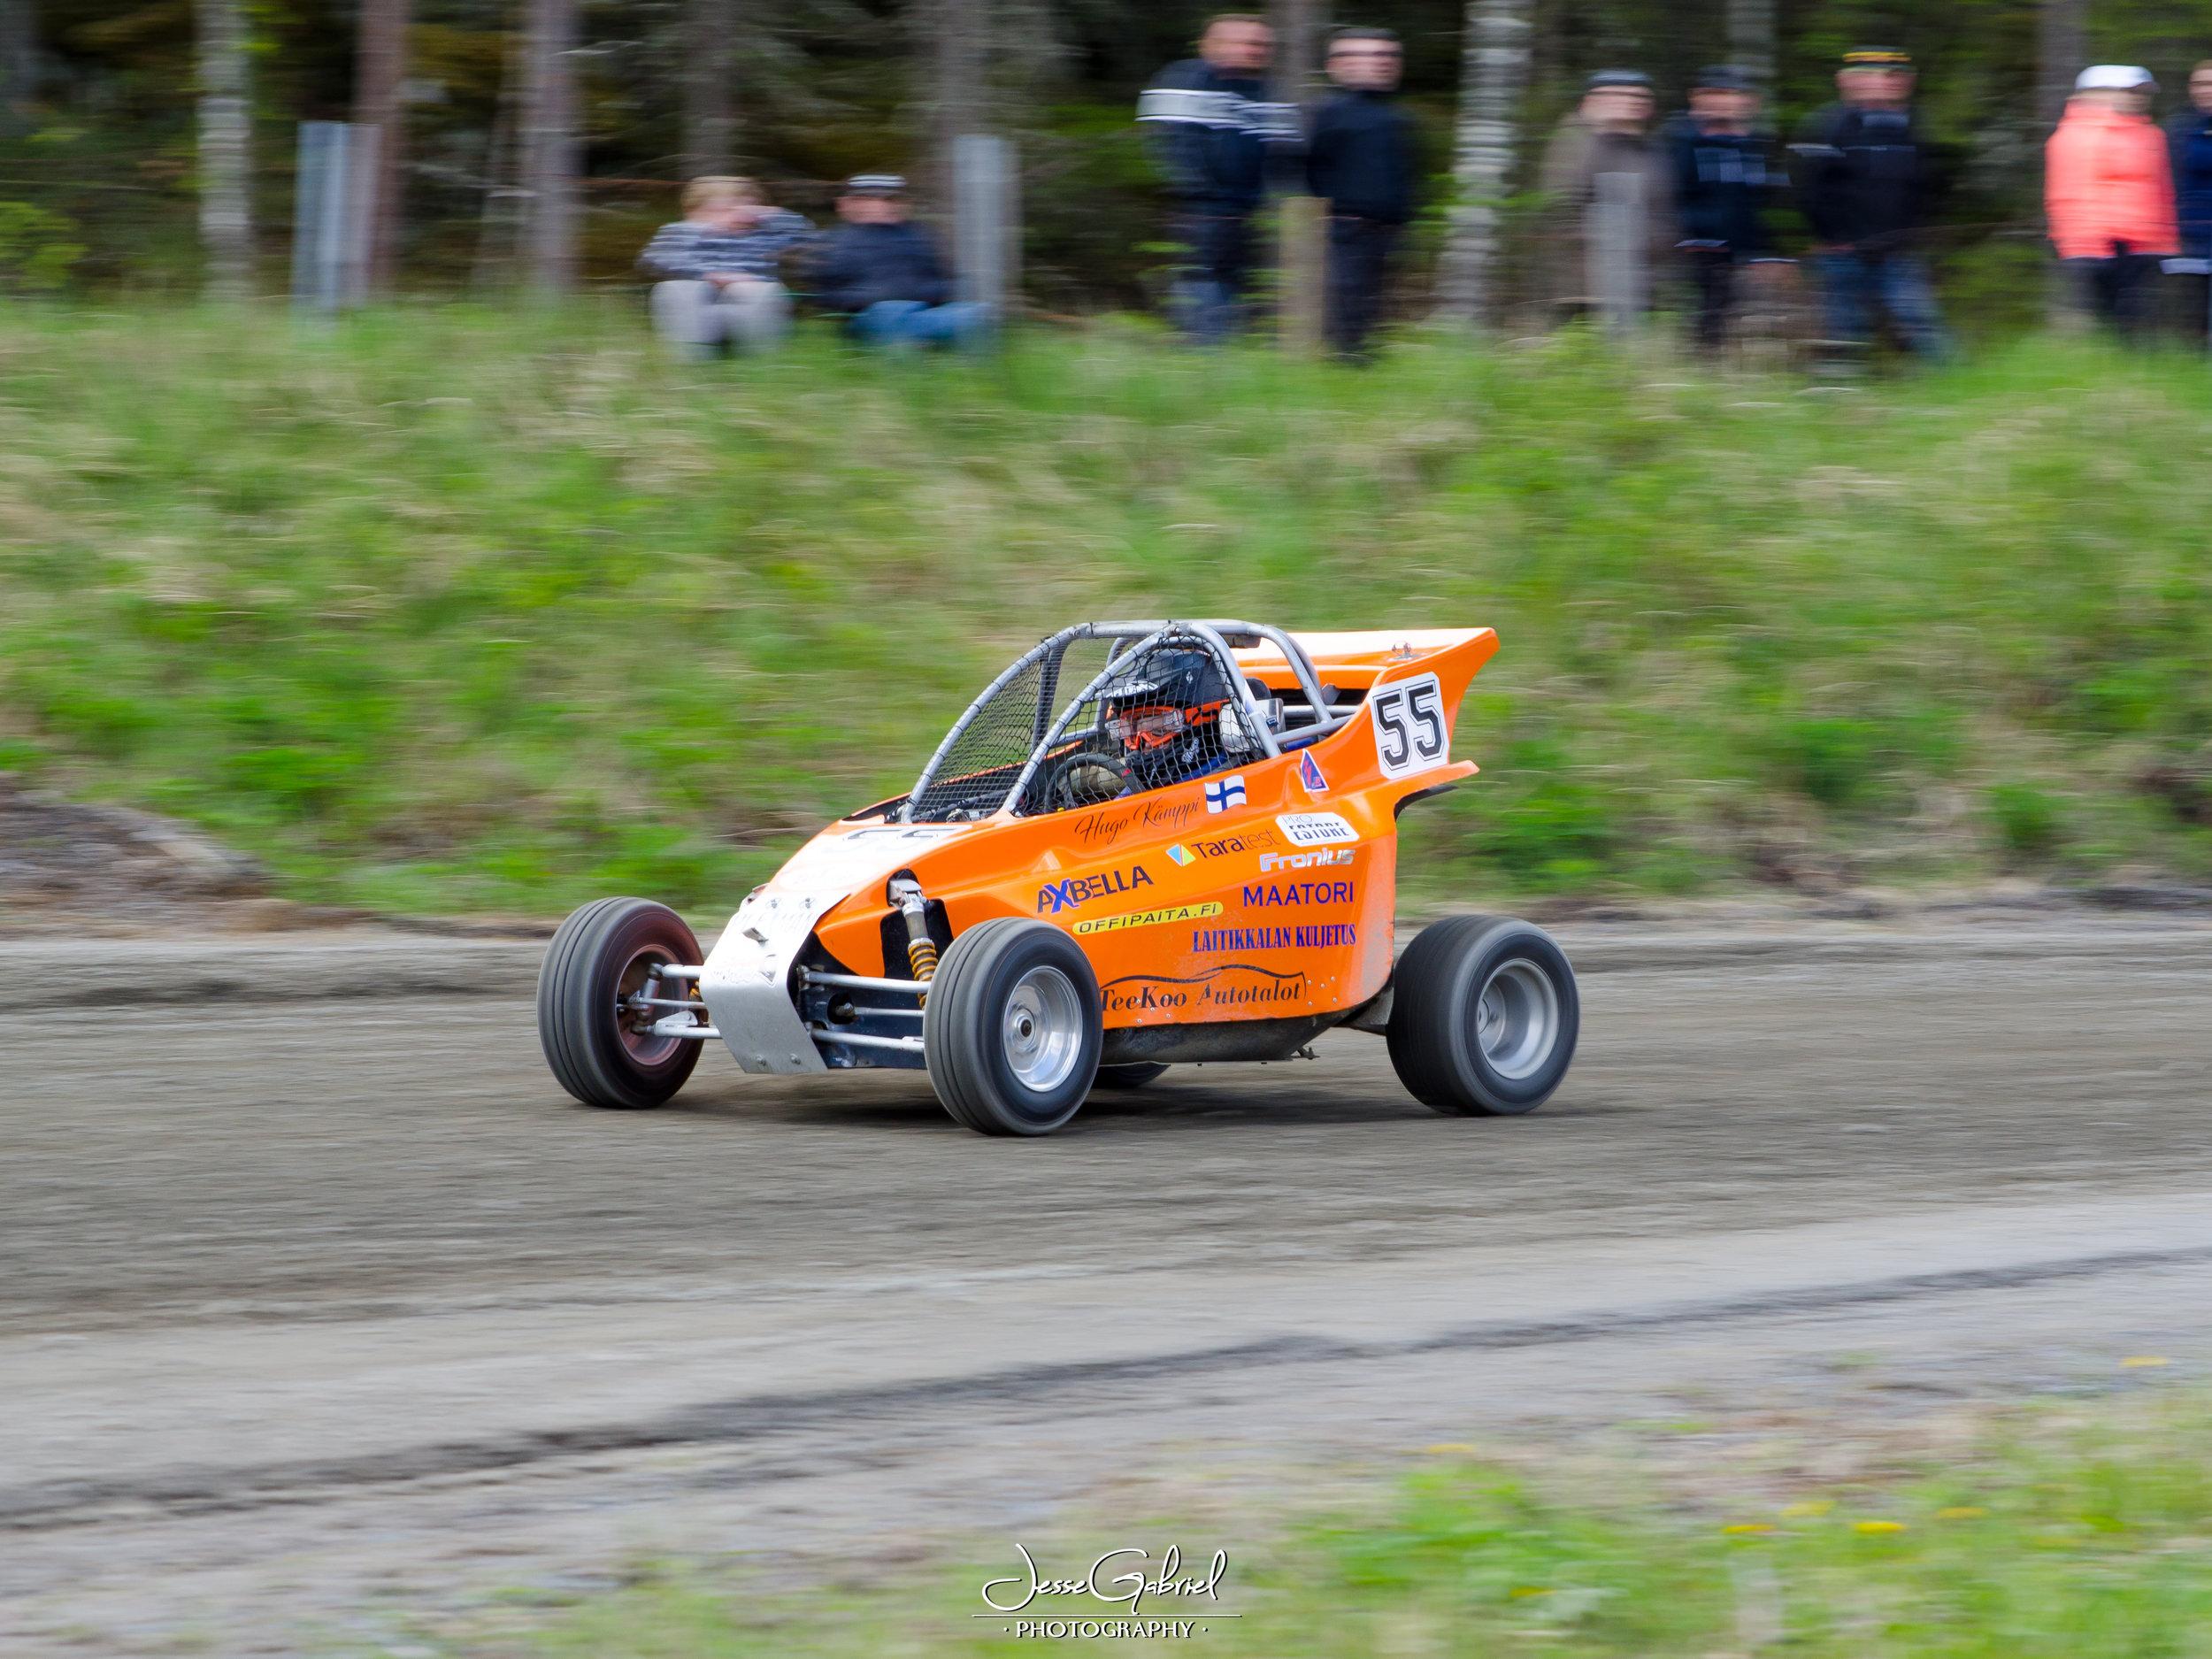 #55 Hugo Kämppi - Seura: PirKaAuto: LHR / Suzuki